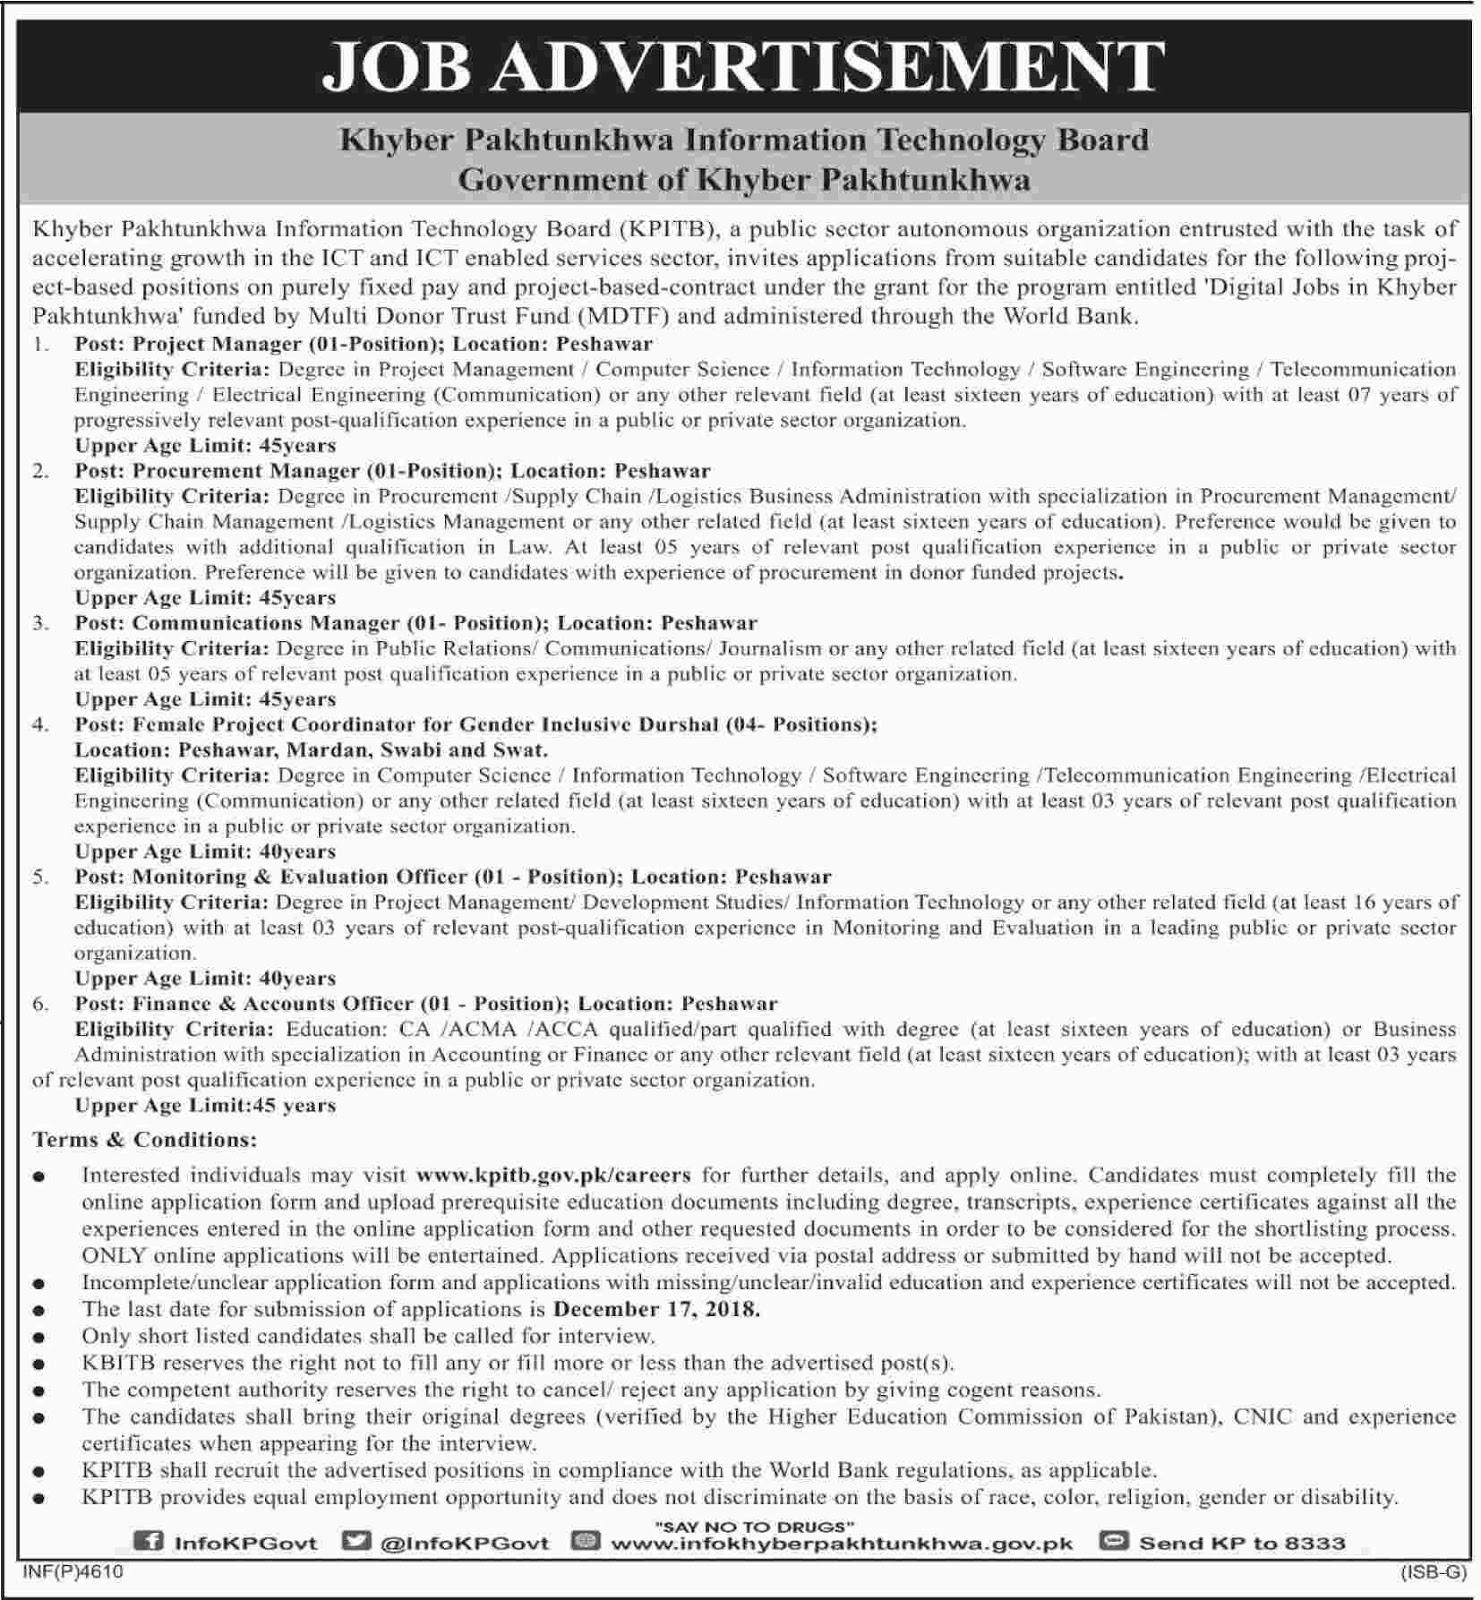 Jobs in Khyber Pakhtunkhwa Information Technology Board Dec 2018